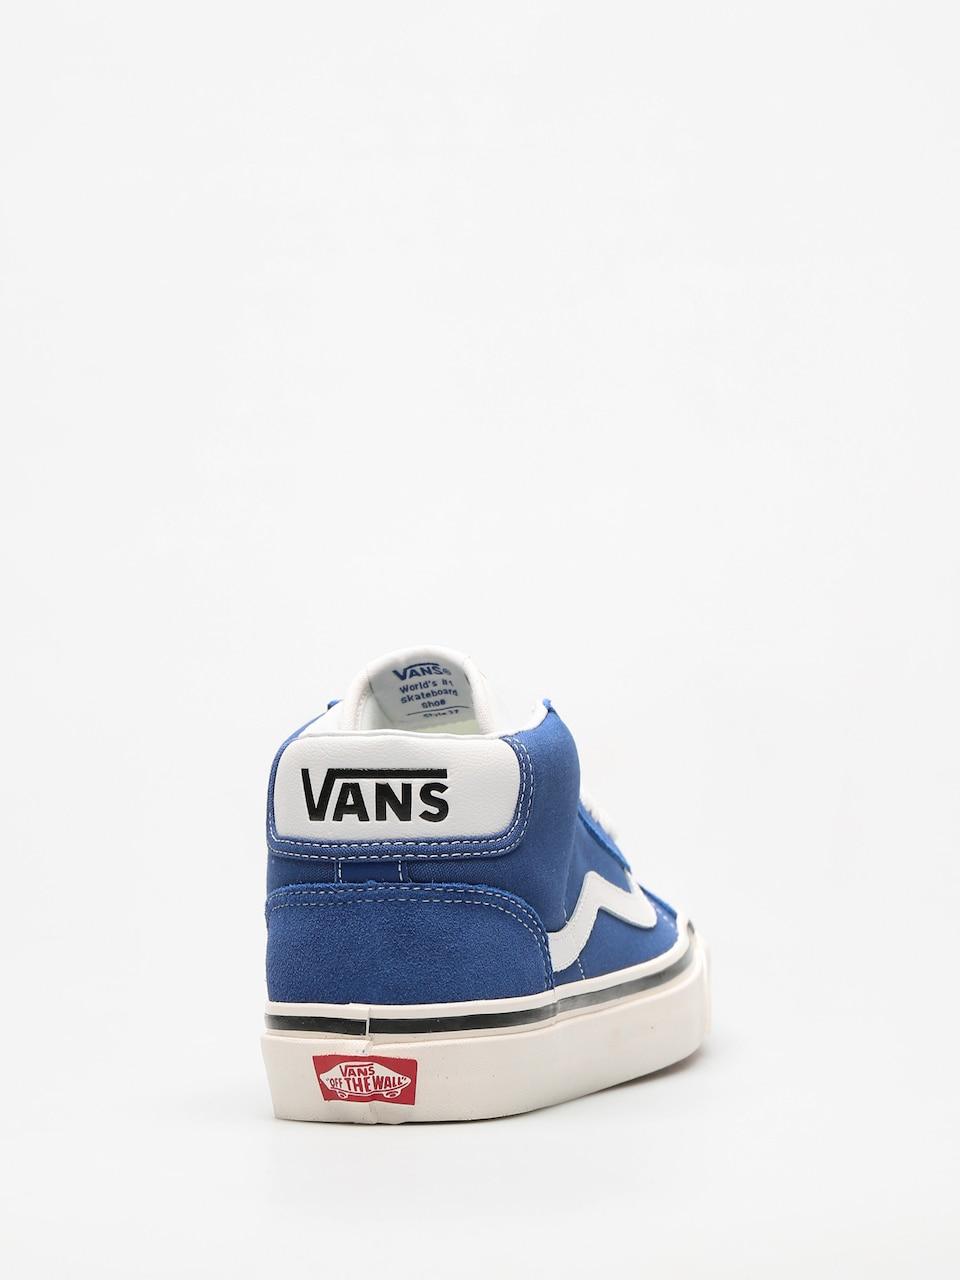 Vans Mid Skool 37 DX (Anaheim Factory) OG Blue | Footshop